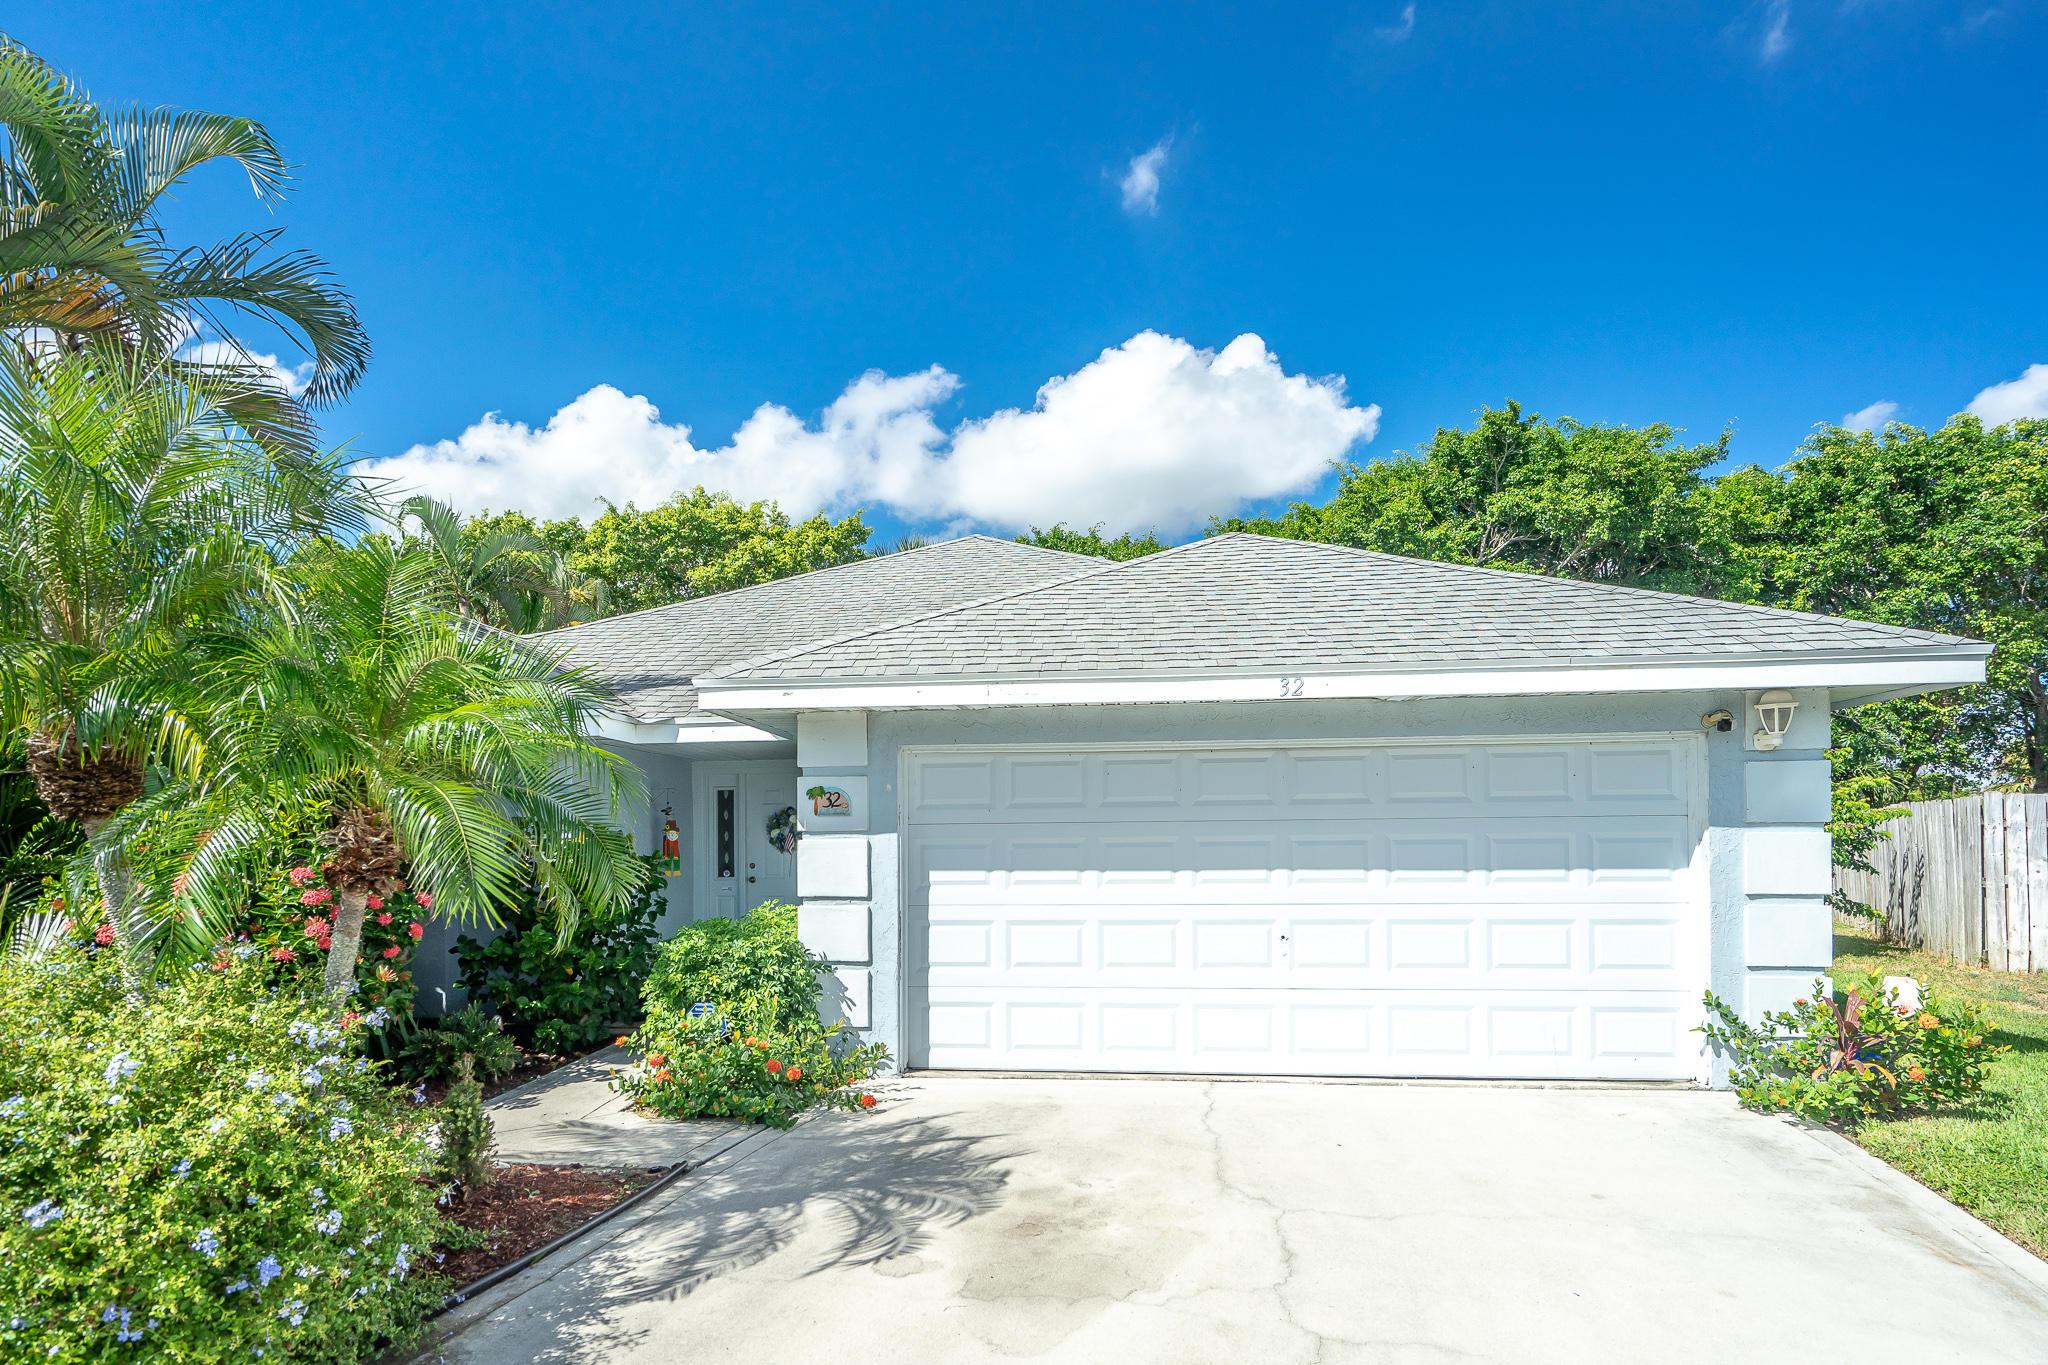 32 Heather Cove Drive Boynton Beach, FL 33436